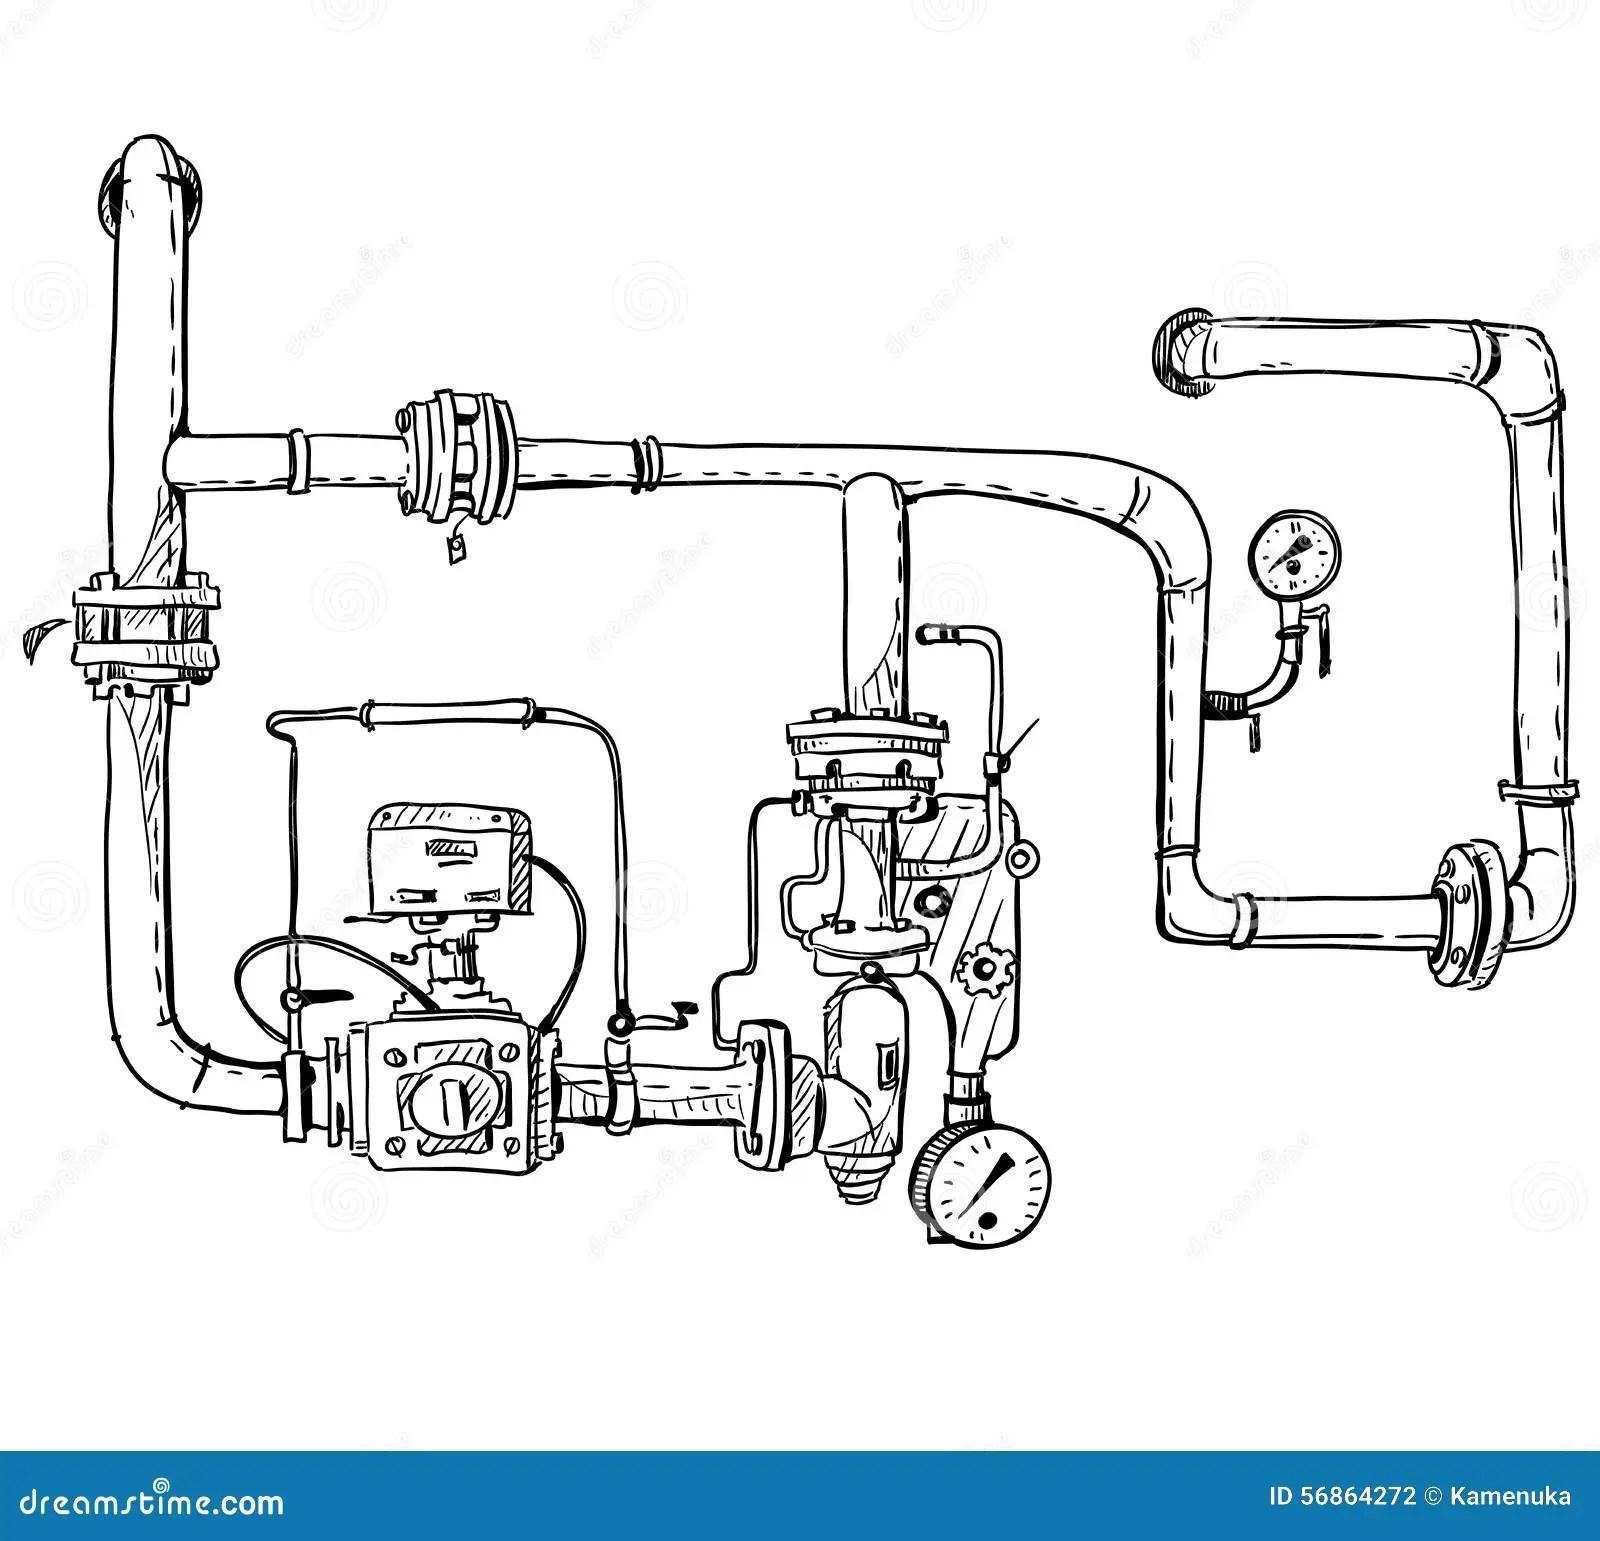 Boiler Room Pipes Vector Sketch Stock Vector